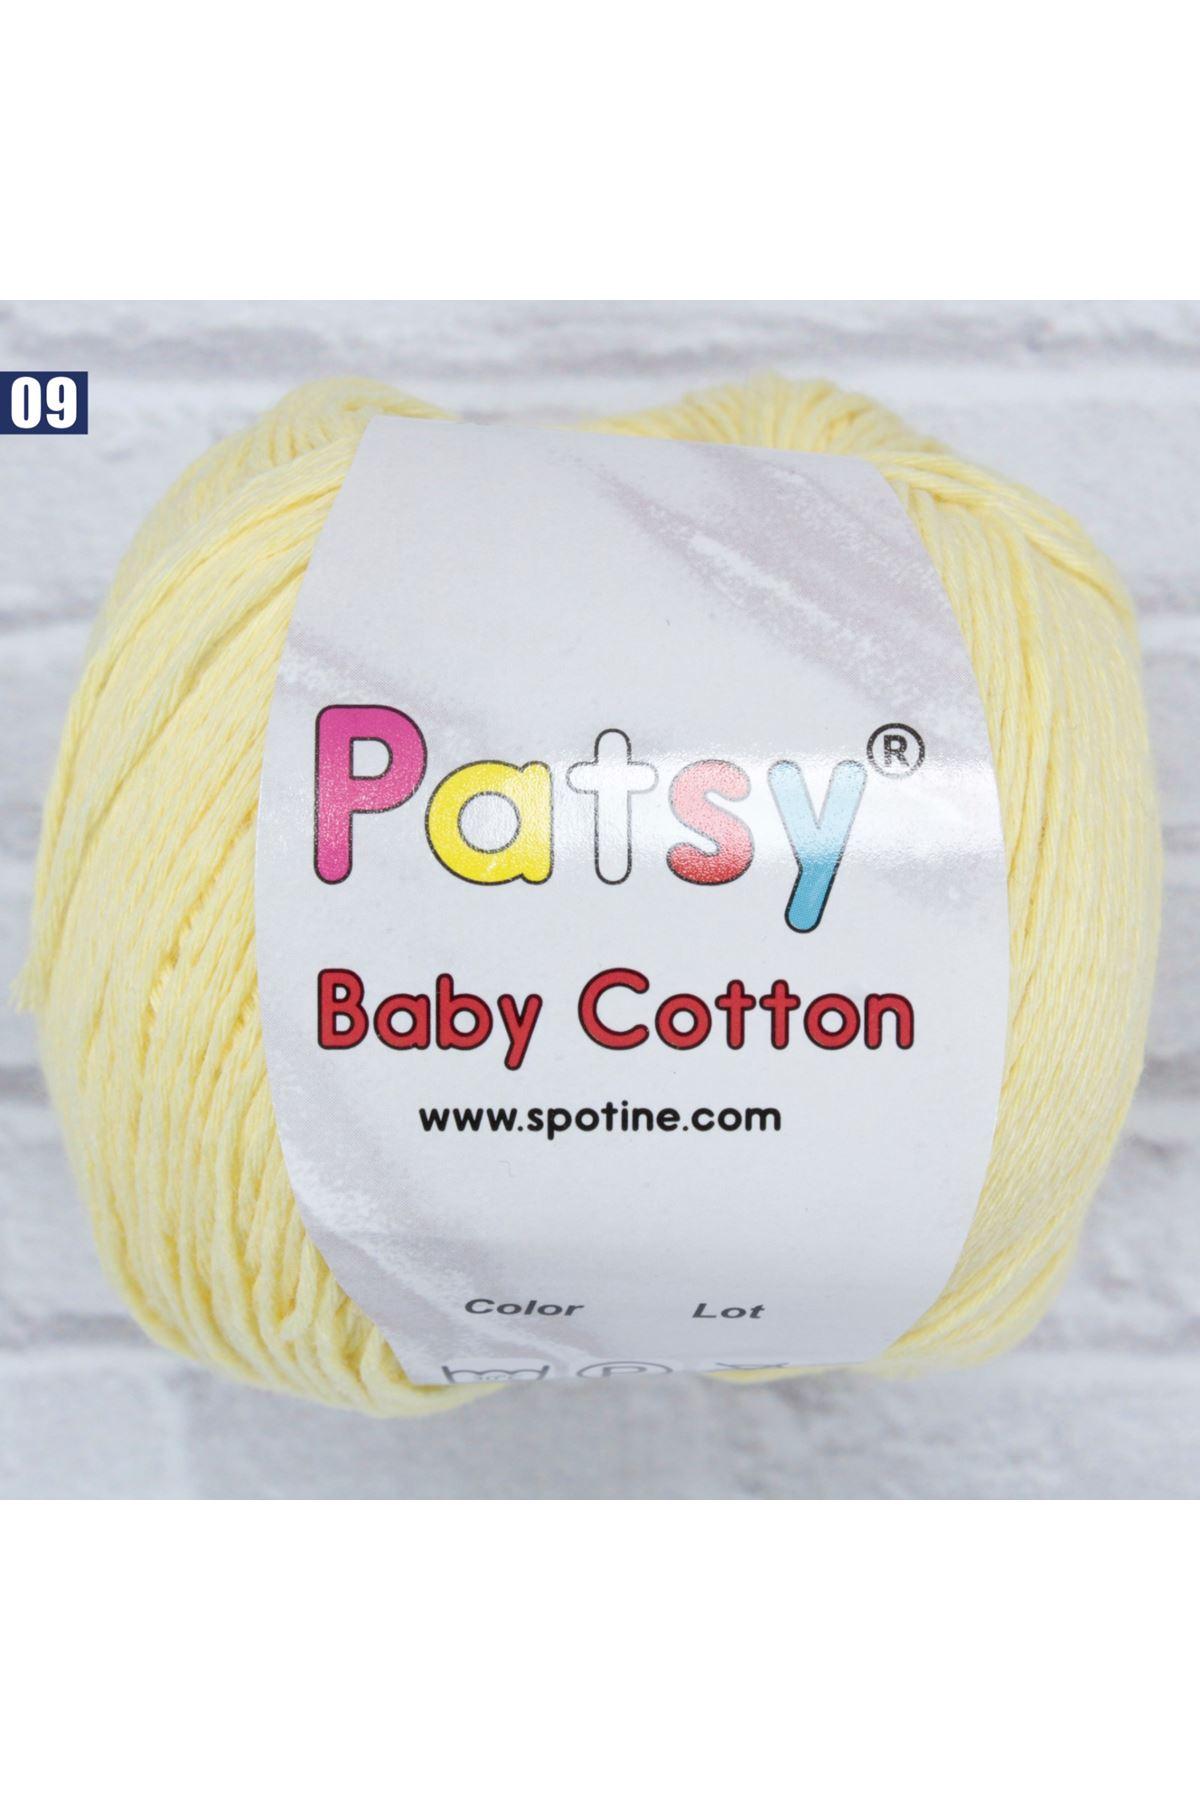 Patsy Baby Cotton 09